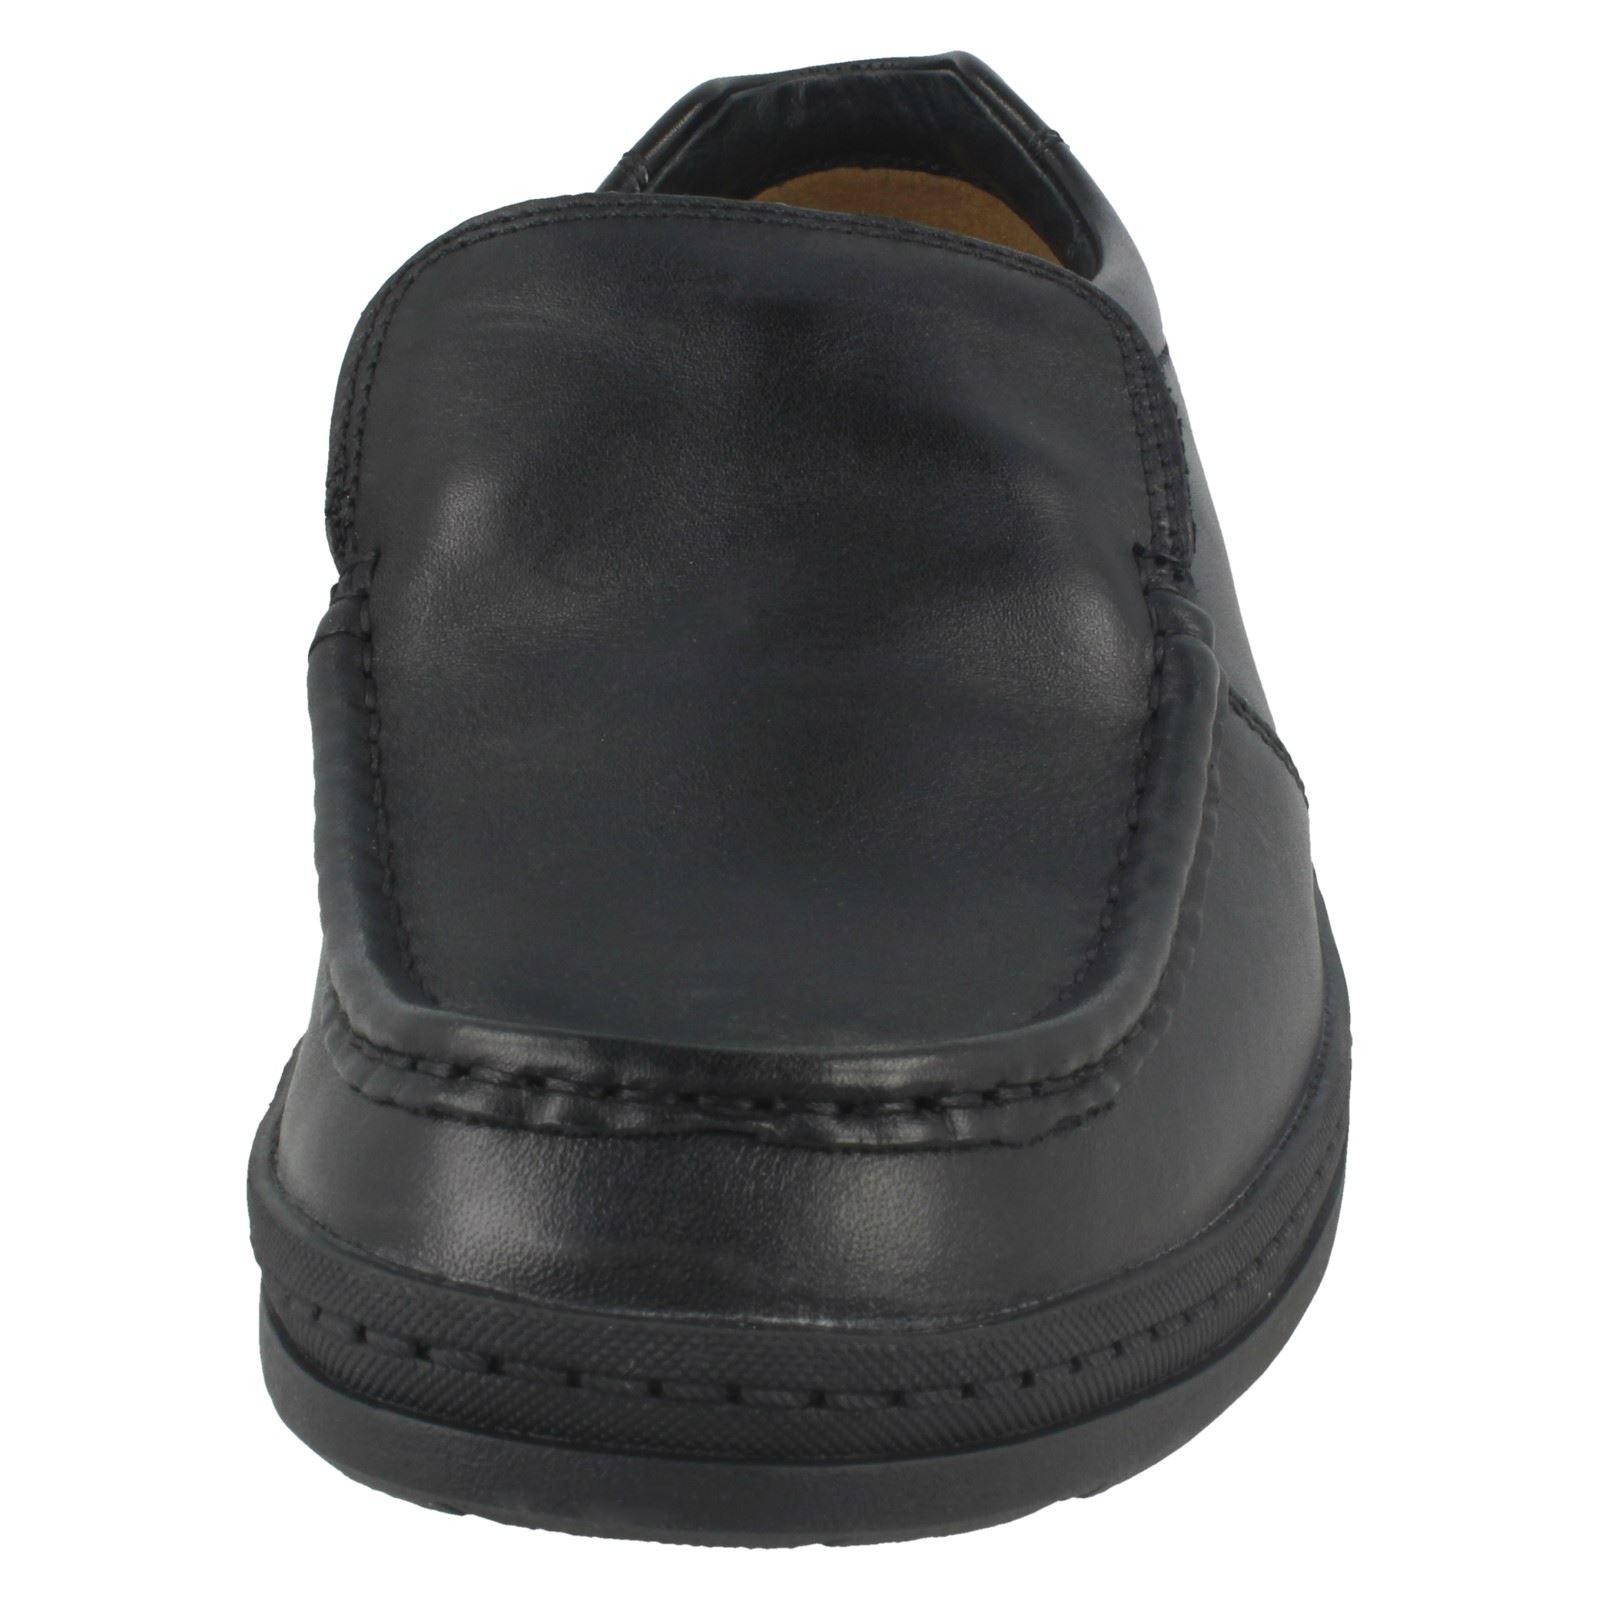 Para Hombre Clarks Zapatos celular inteligente Cojín de